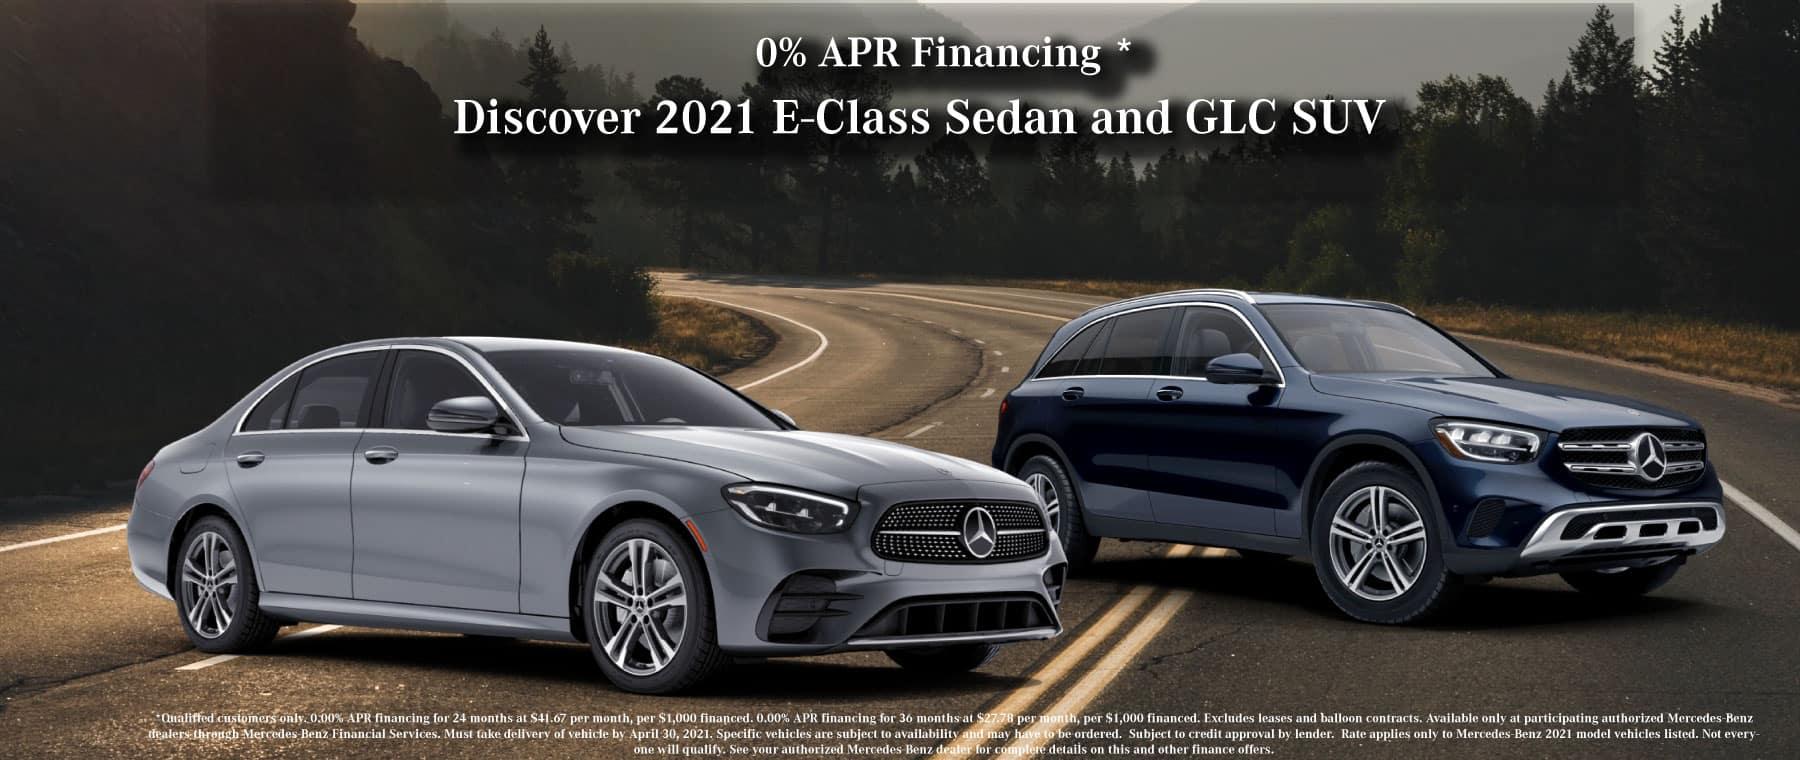 Mercedes-Benz E class sedan and glc suv financingspecial